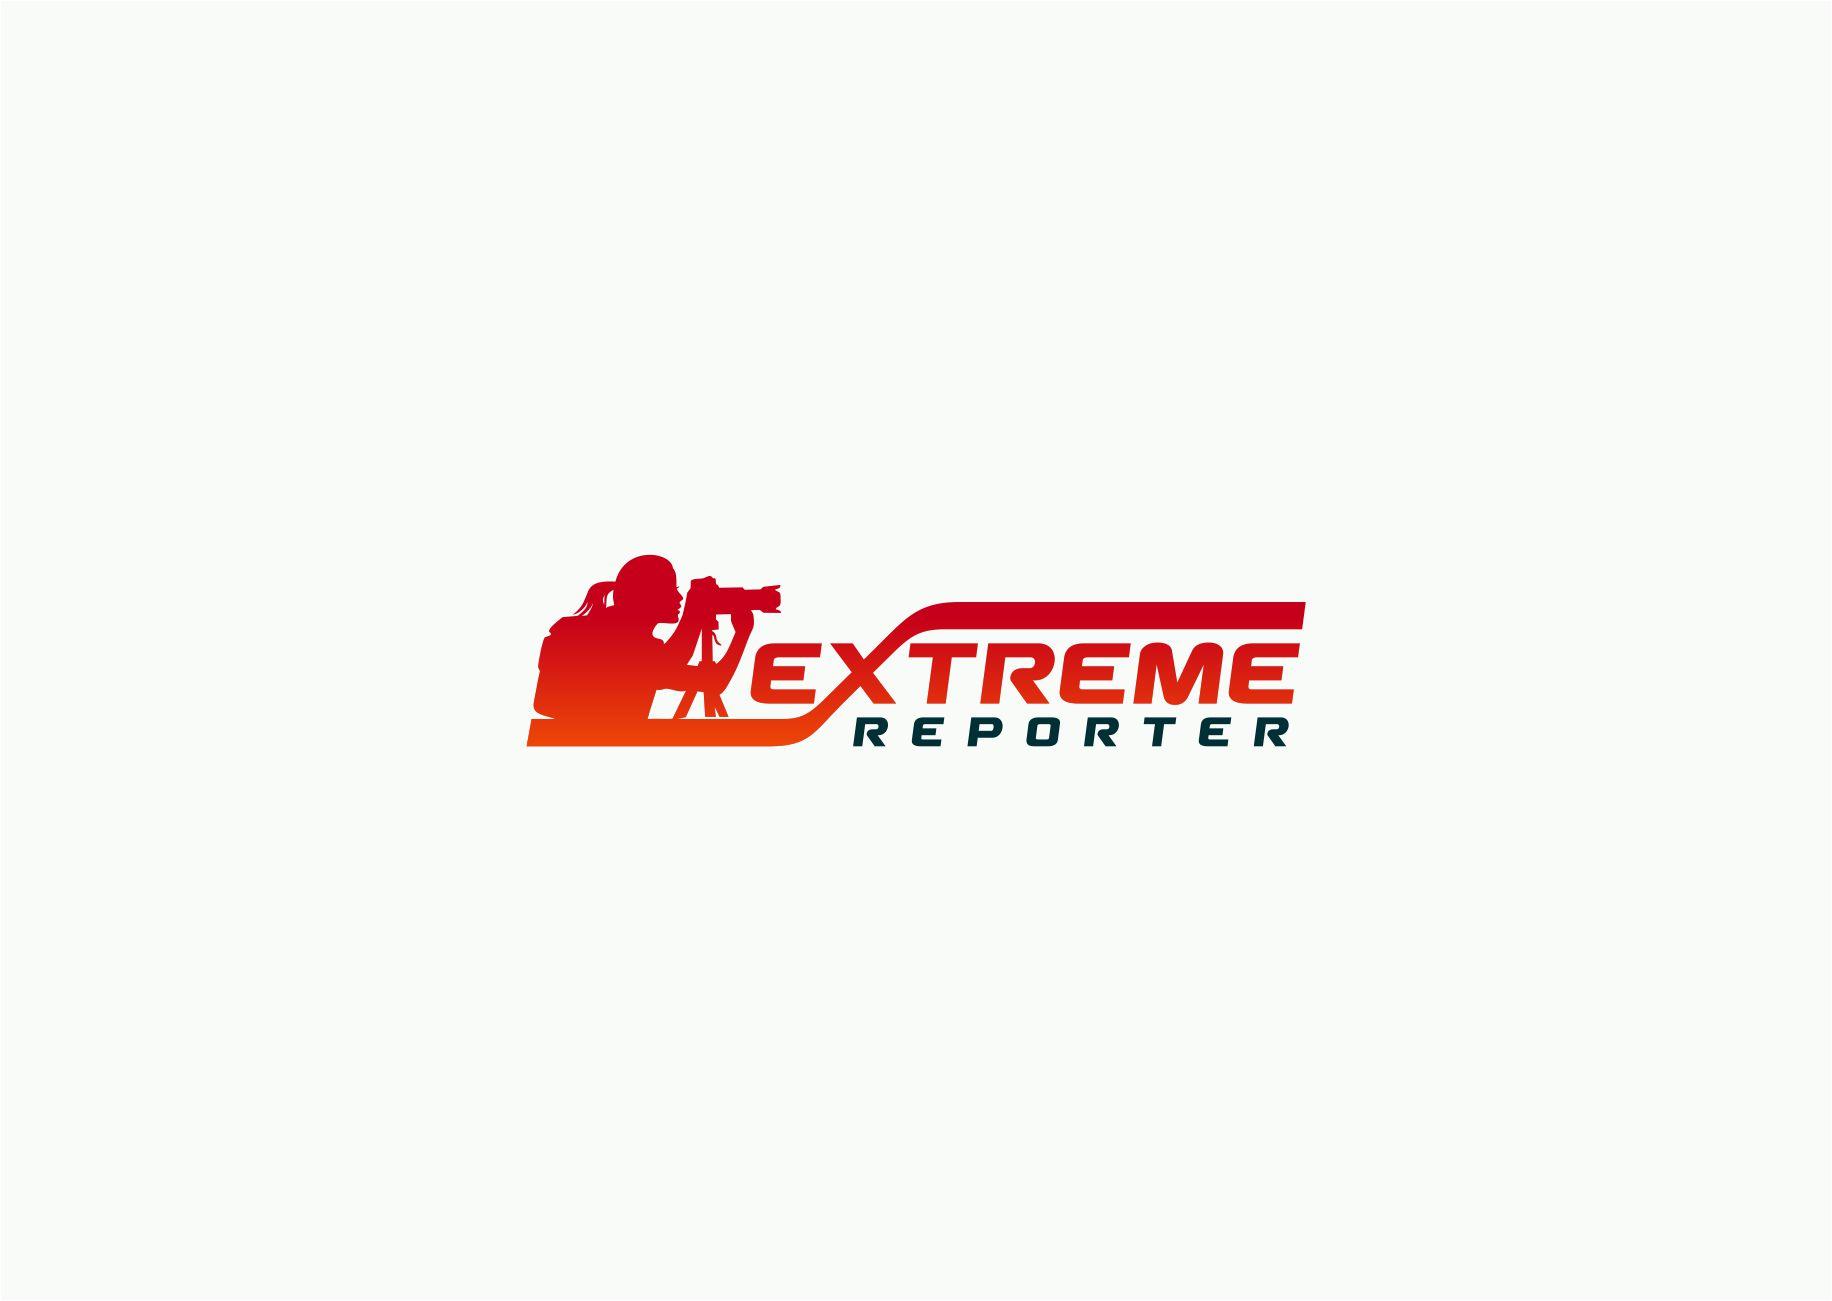 Логотип для экстрим фотографа.  фото f_4075a54d0f430ab5.jpg